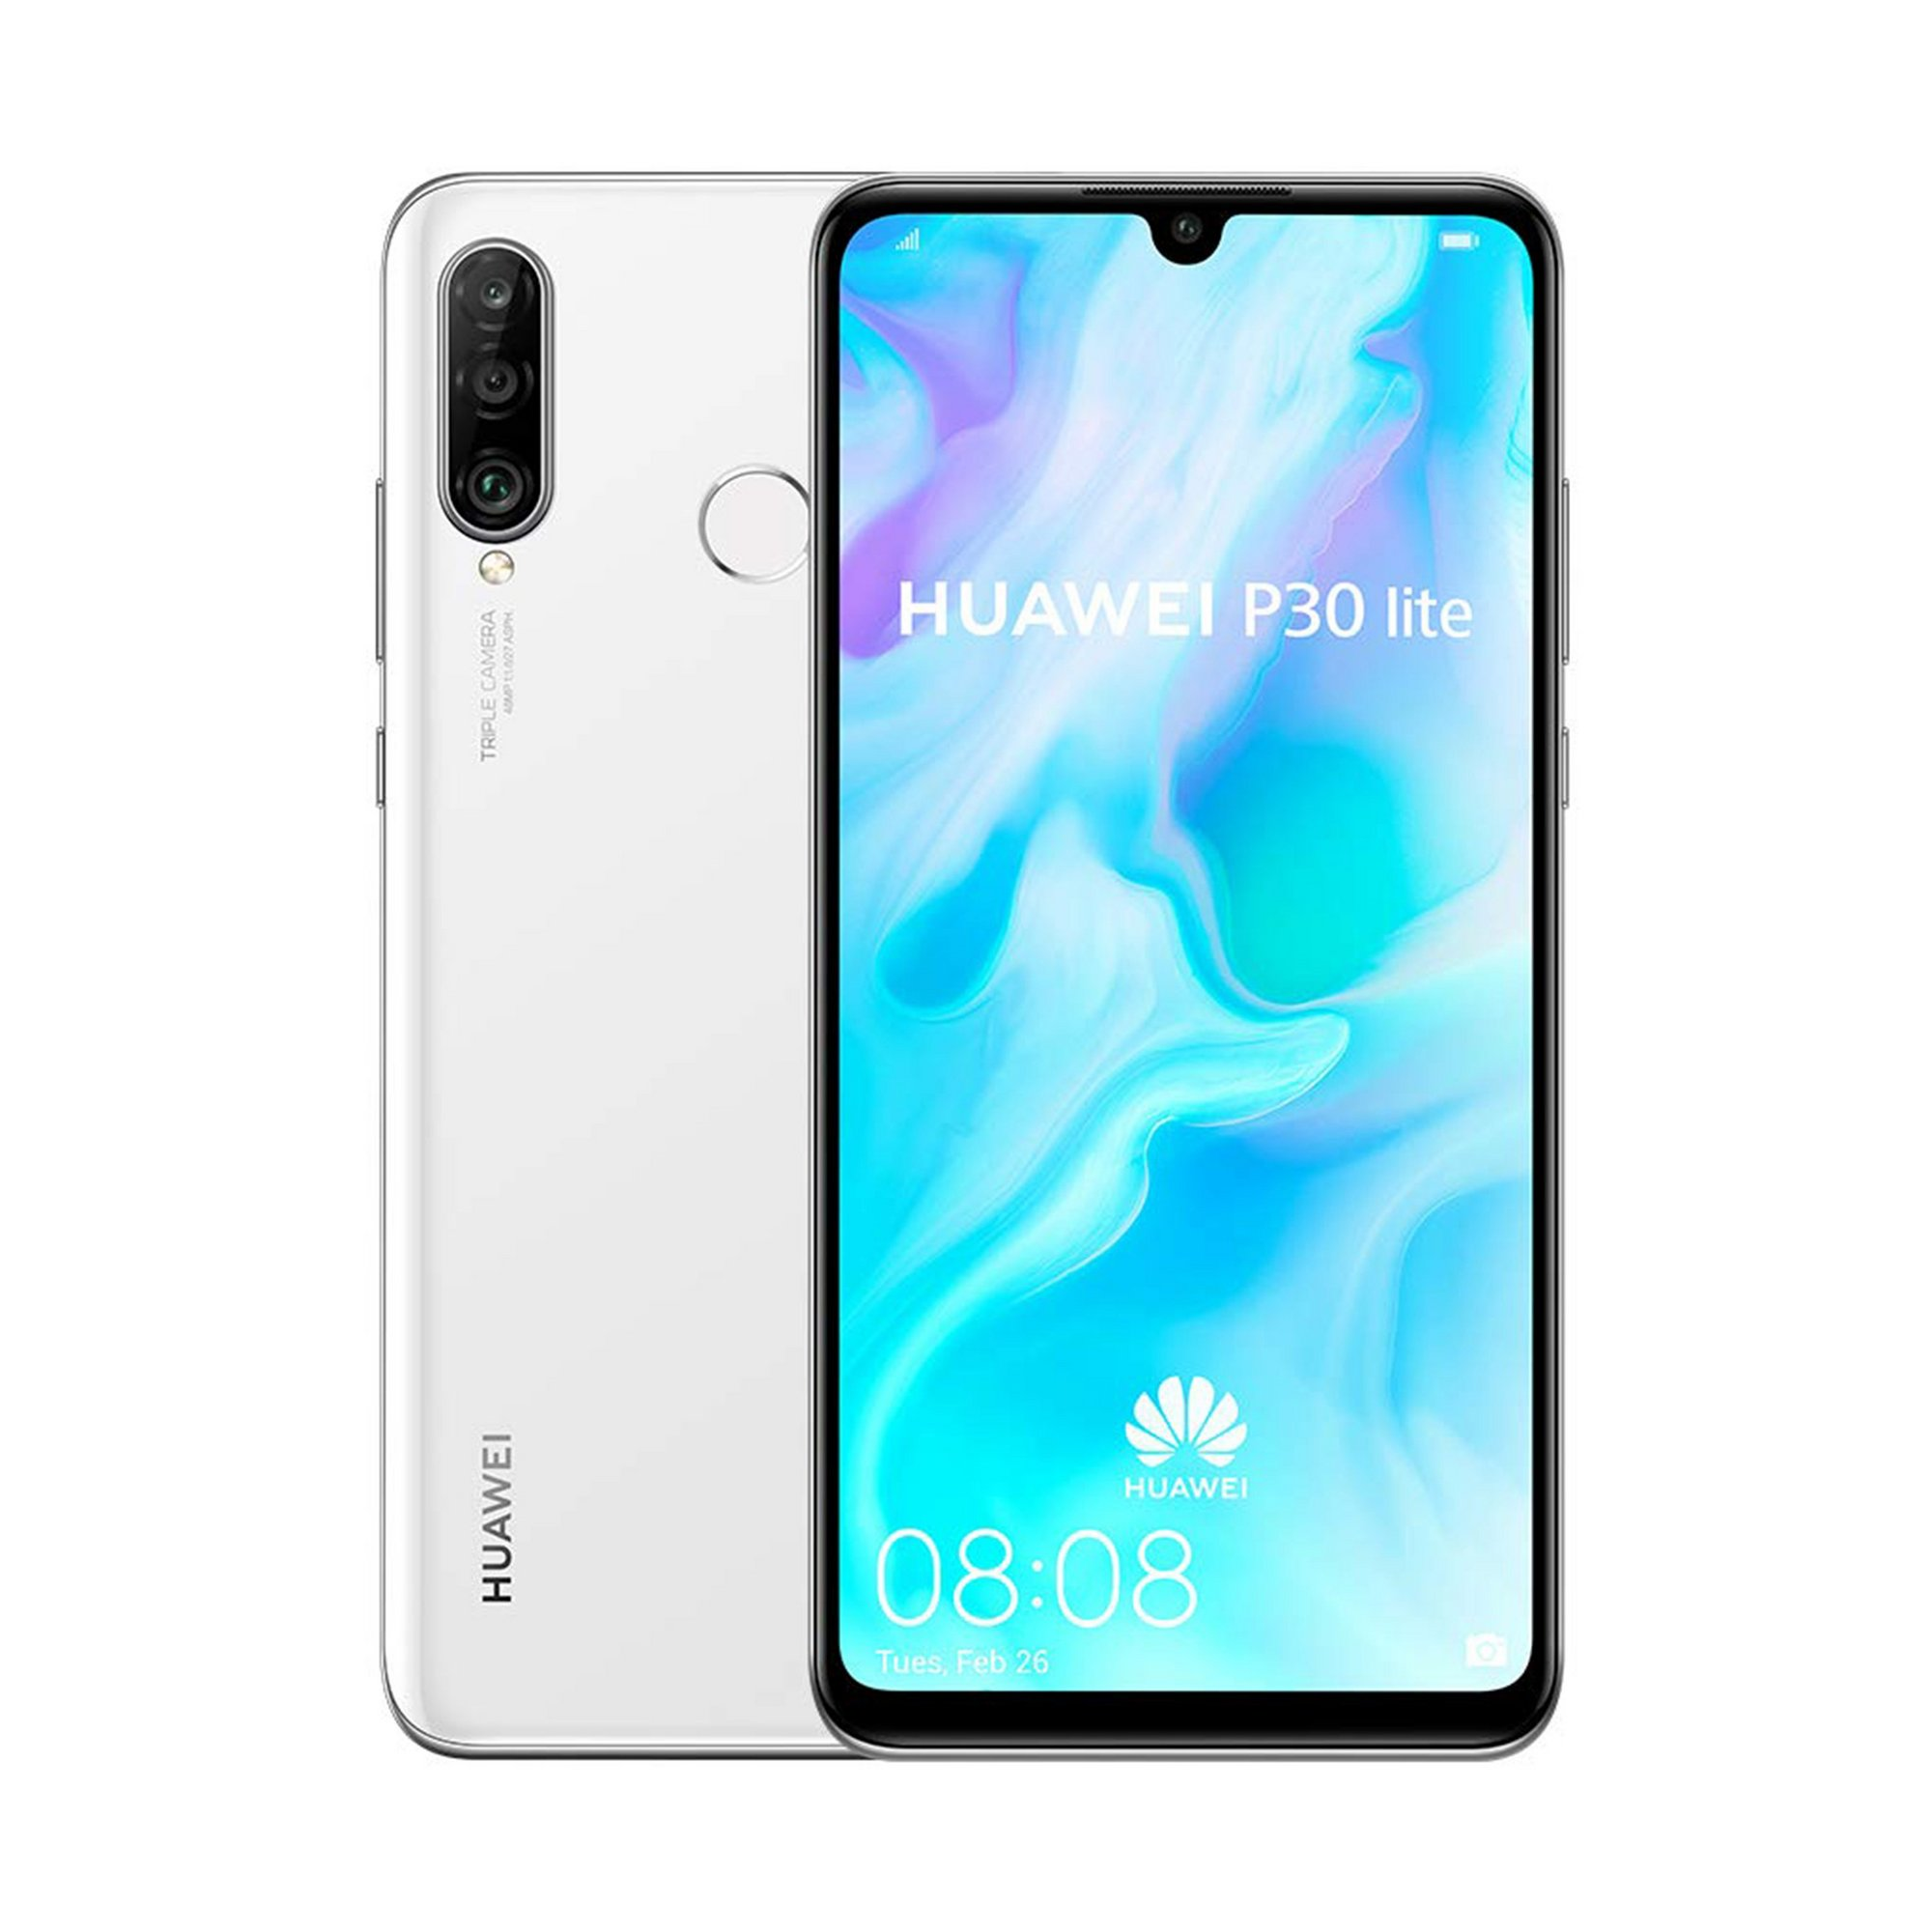 Image of Huawei P30 Lite 128GB Smartphone